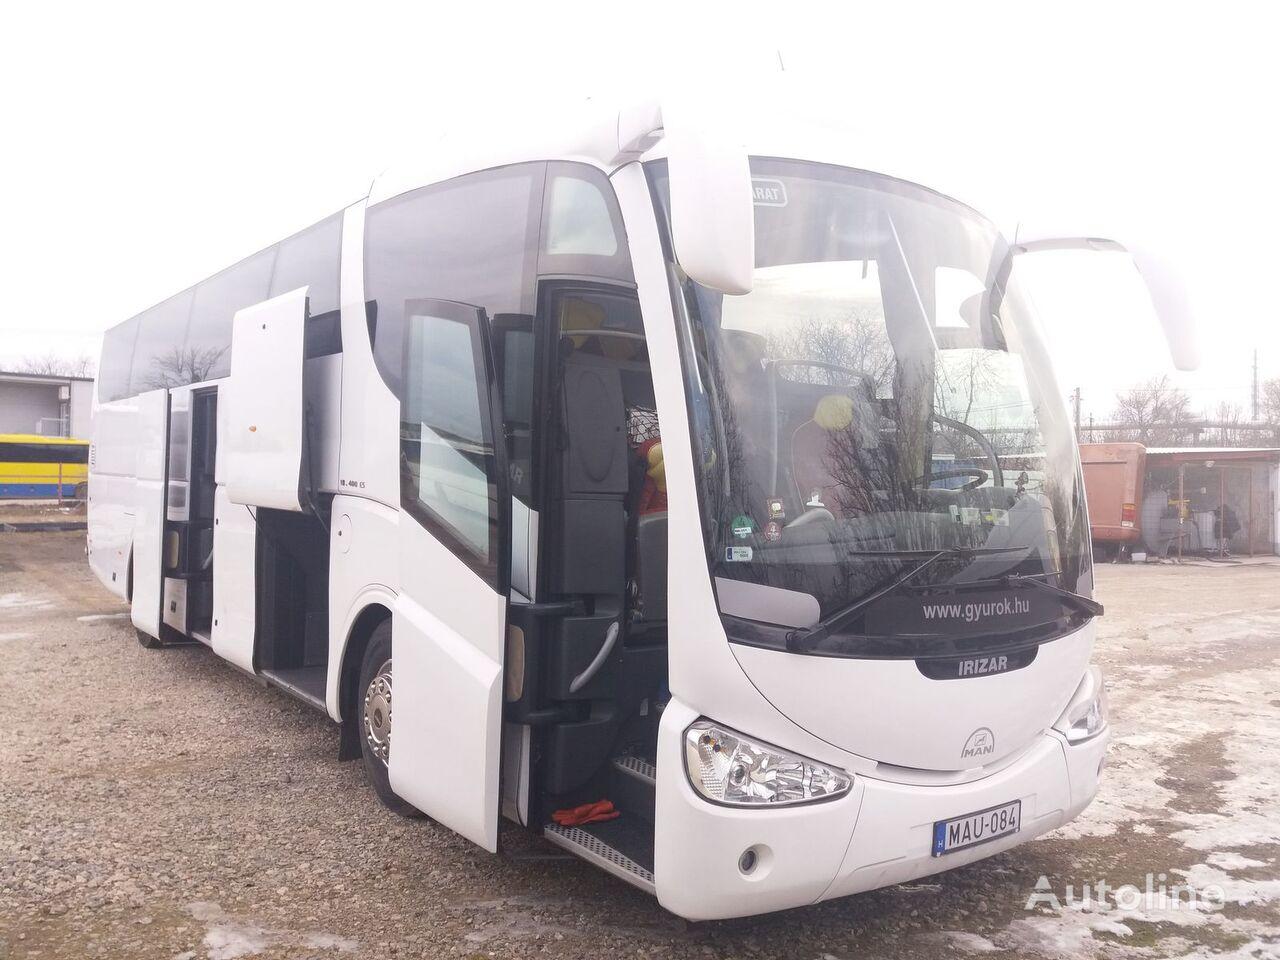 MAN PB 12.20 coach bus